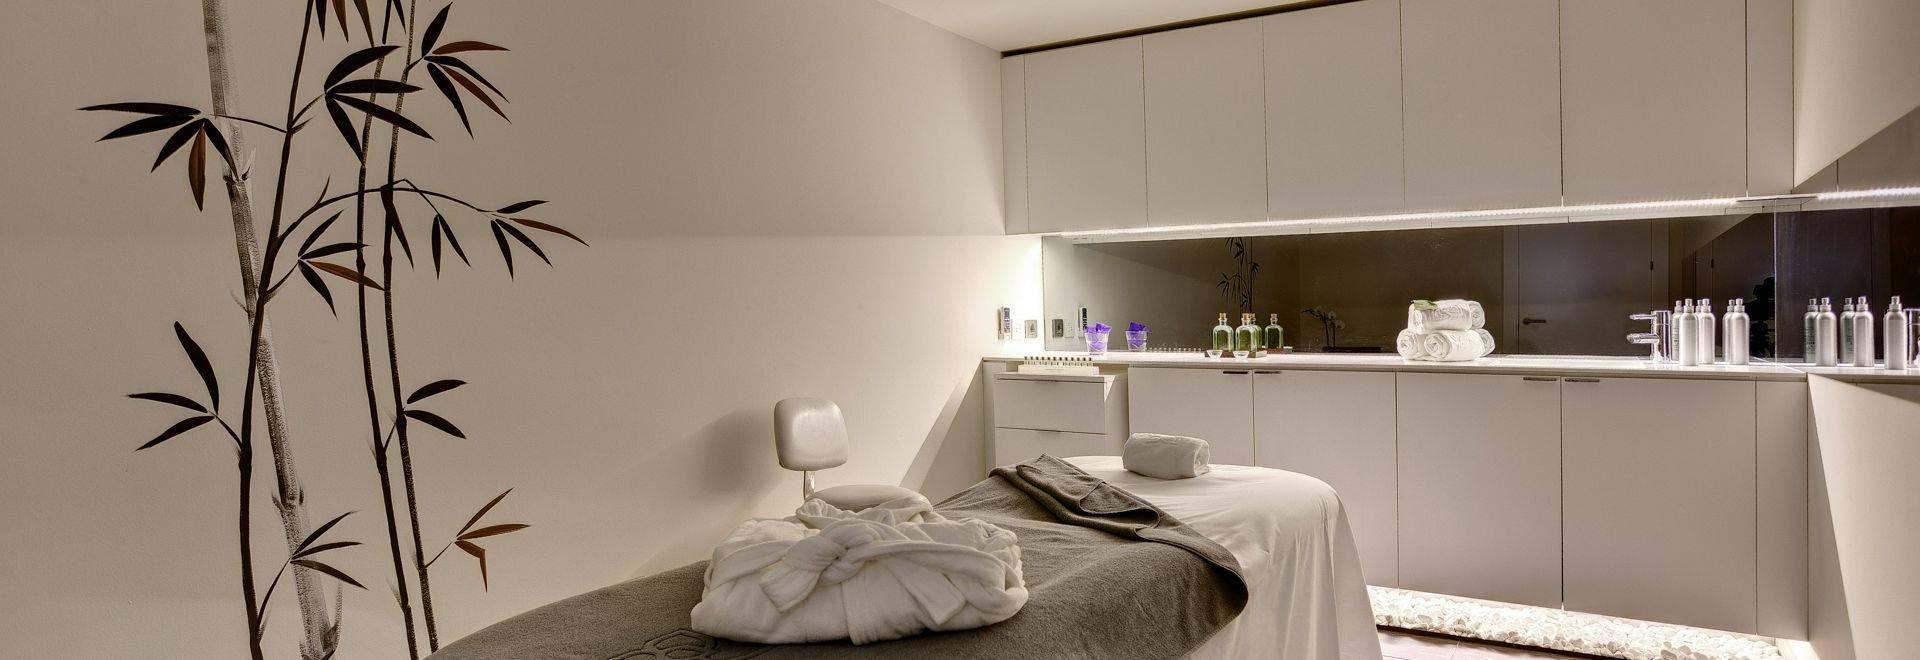 SHA-Wellness-Clinic-treatment-room-3.jpg